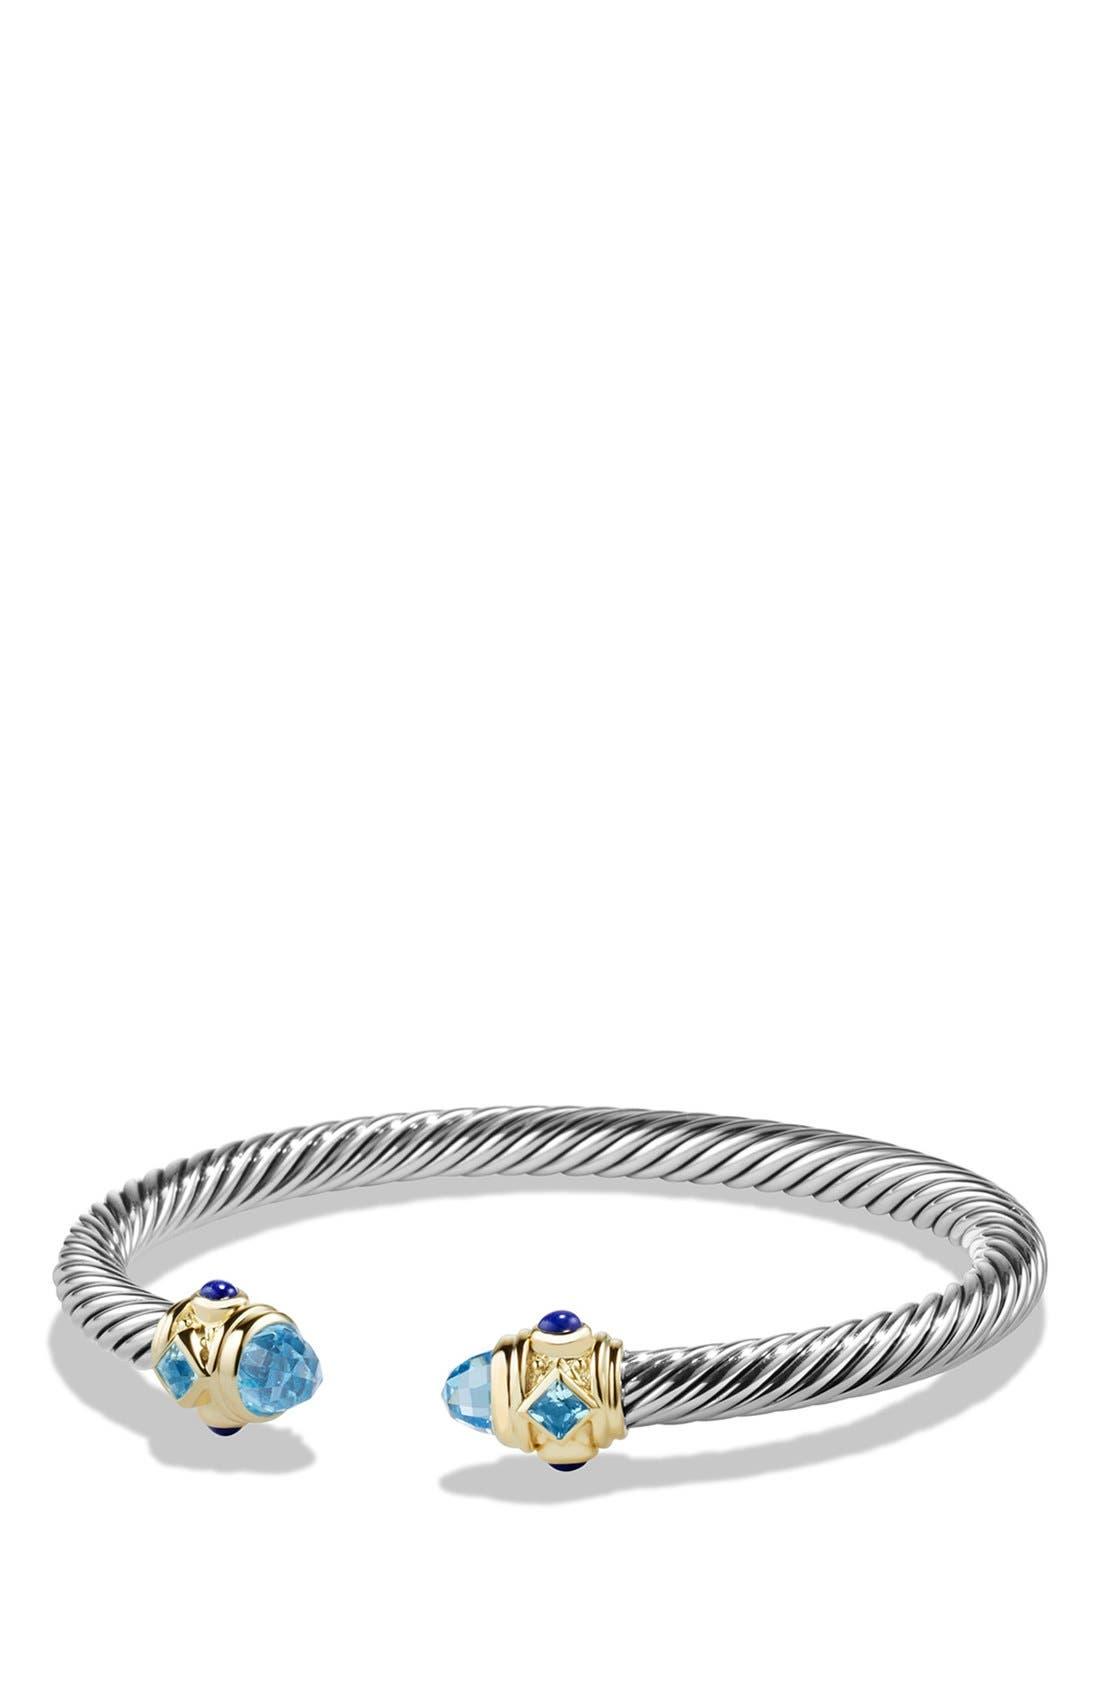 Renaissance Bracelet with Semiprecious Stone & 14k Gold, 5mm,                             Main thumbnail 1, color,                             BLUE TOPAZ